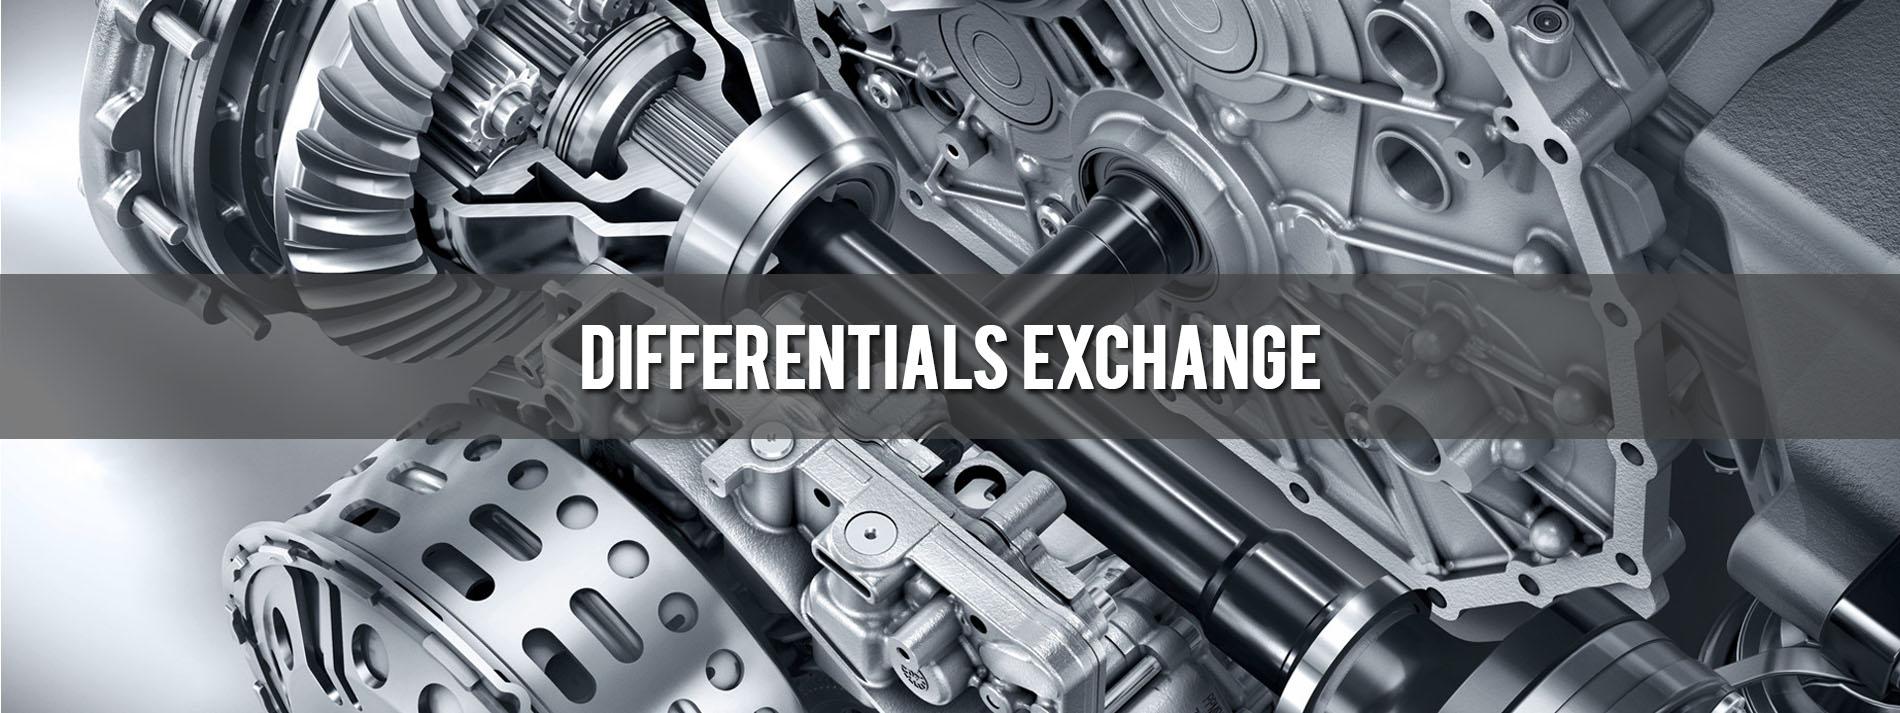 Differentials Exchange